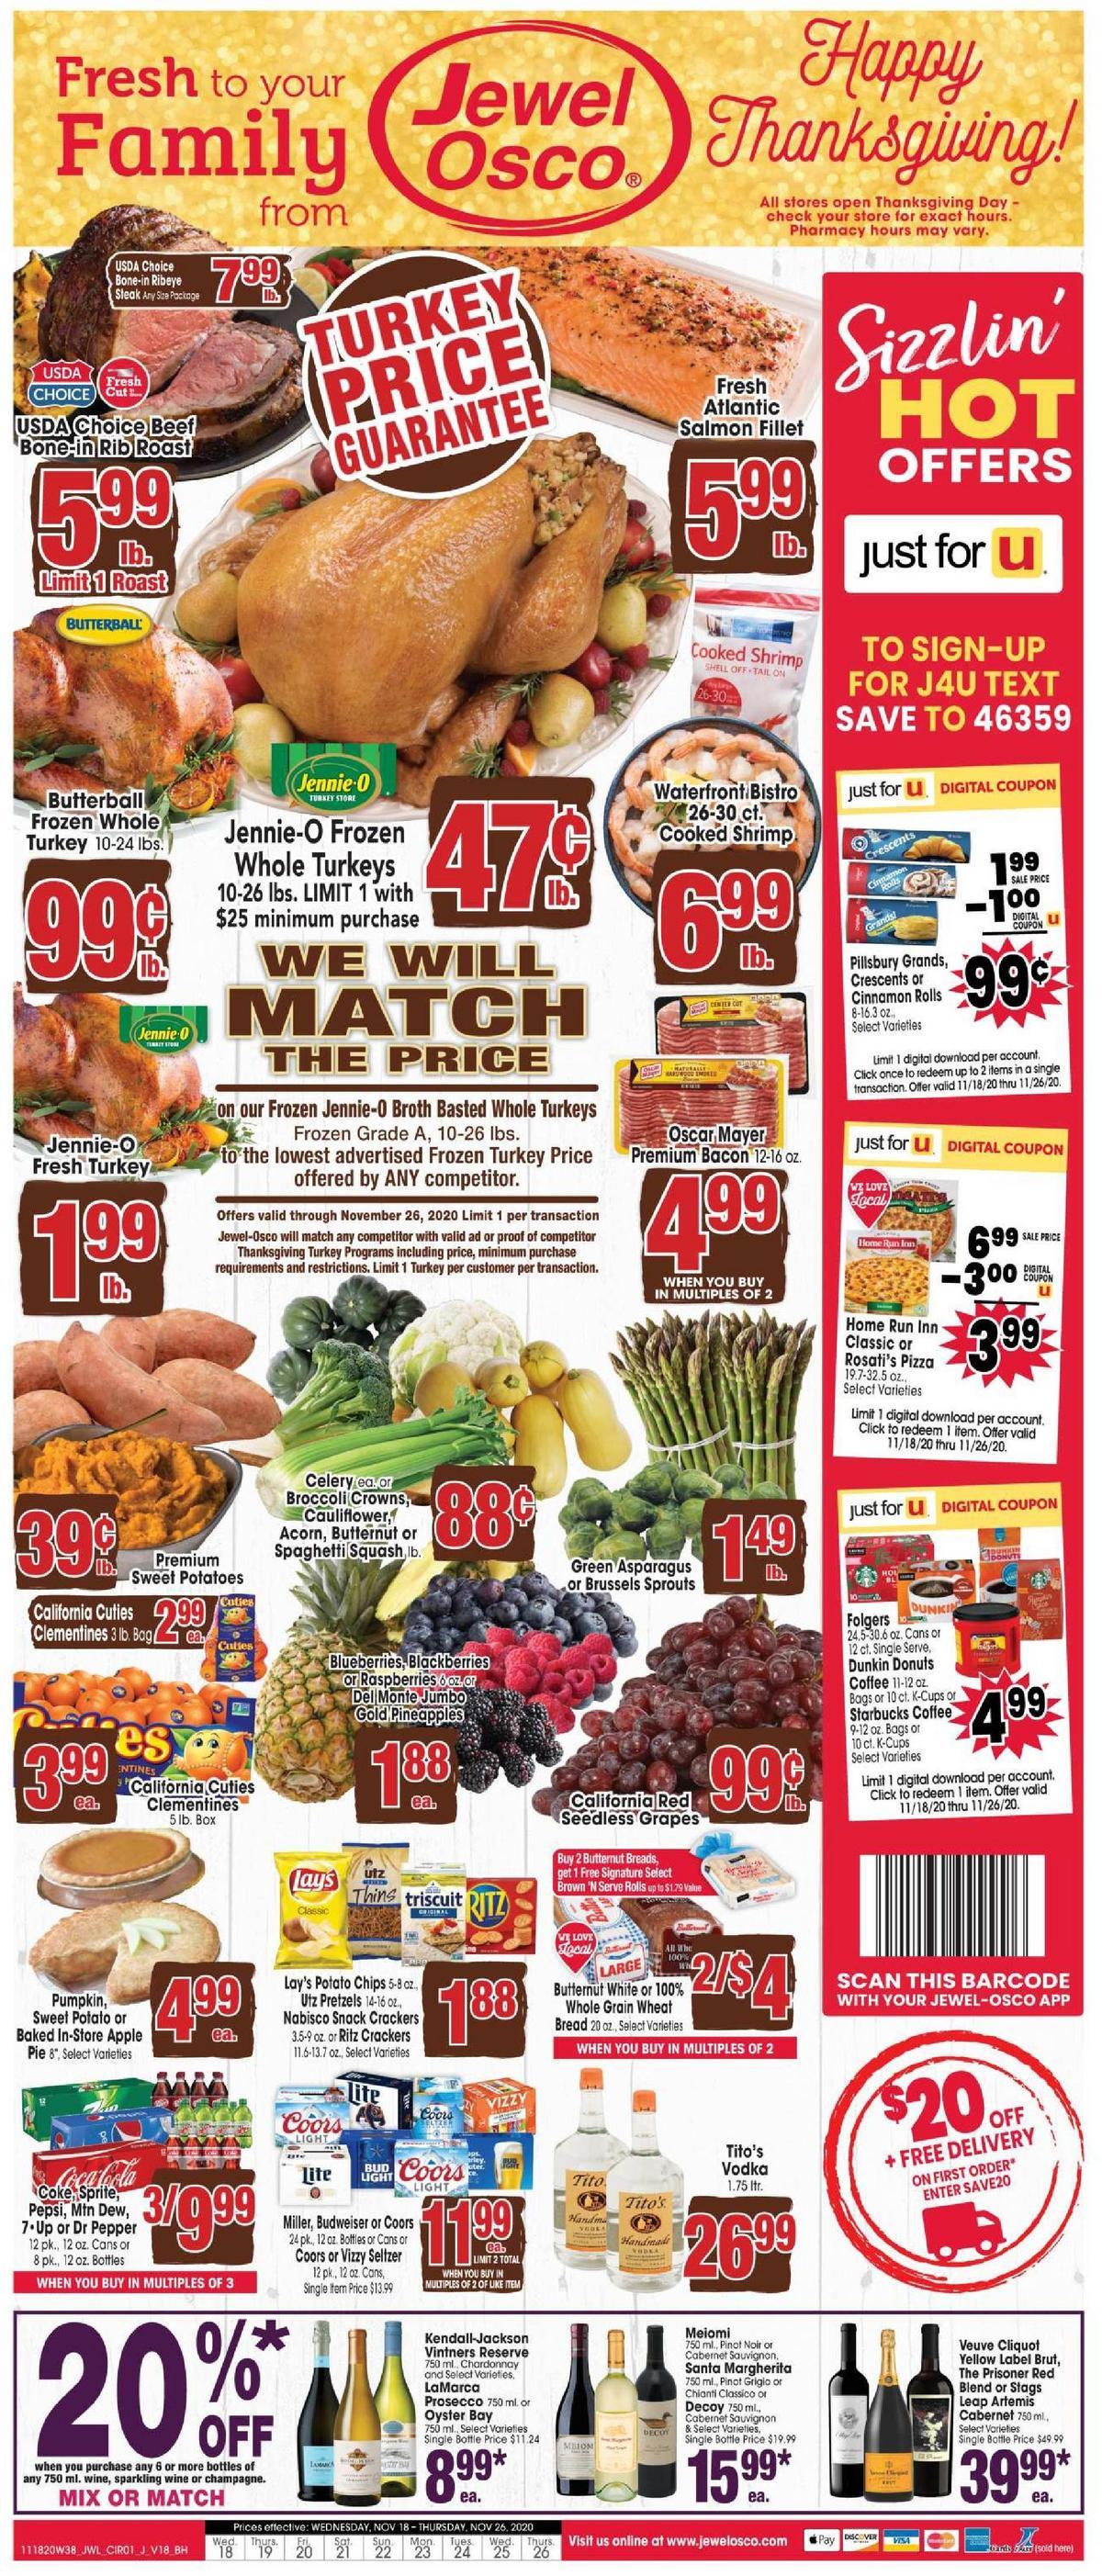 Jewel Osco Weekly Ad from November 18